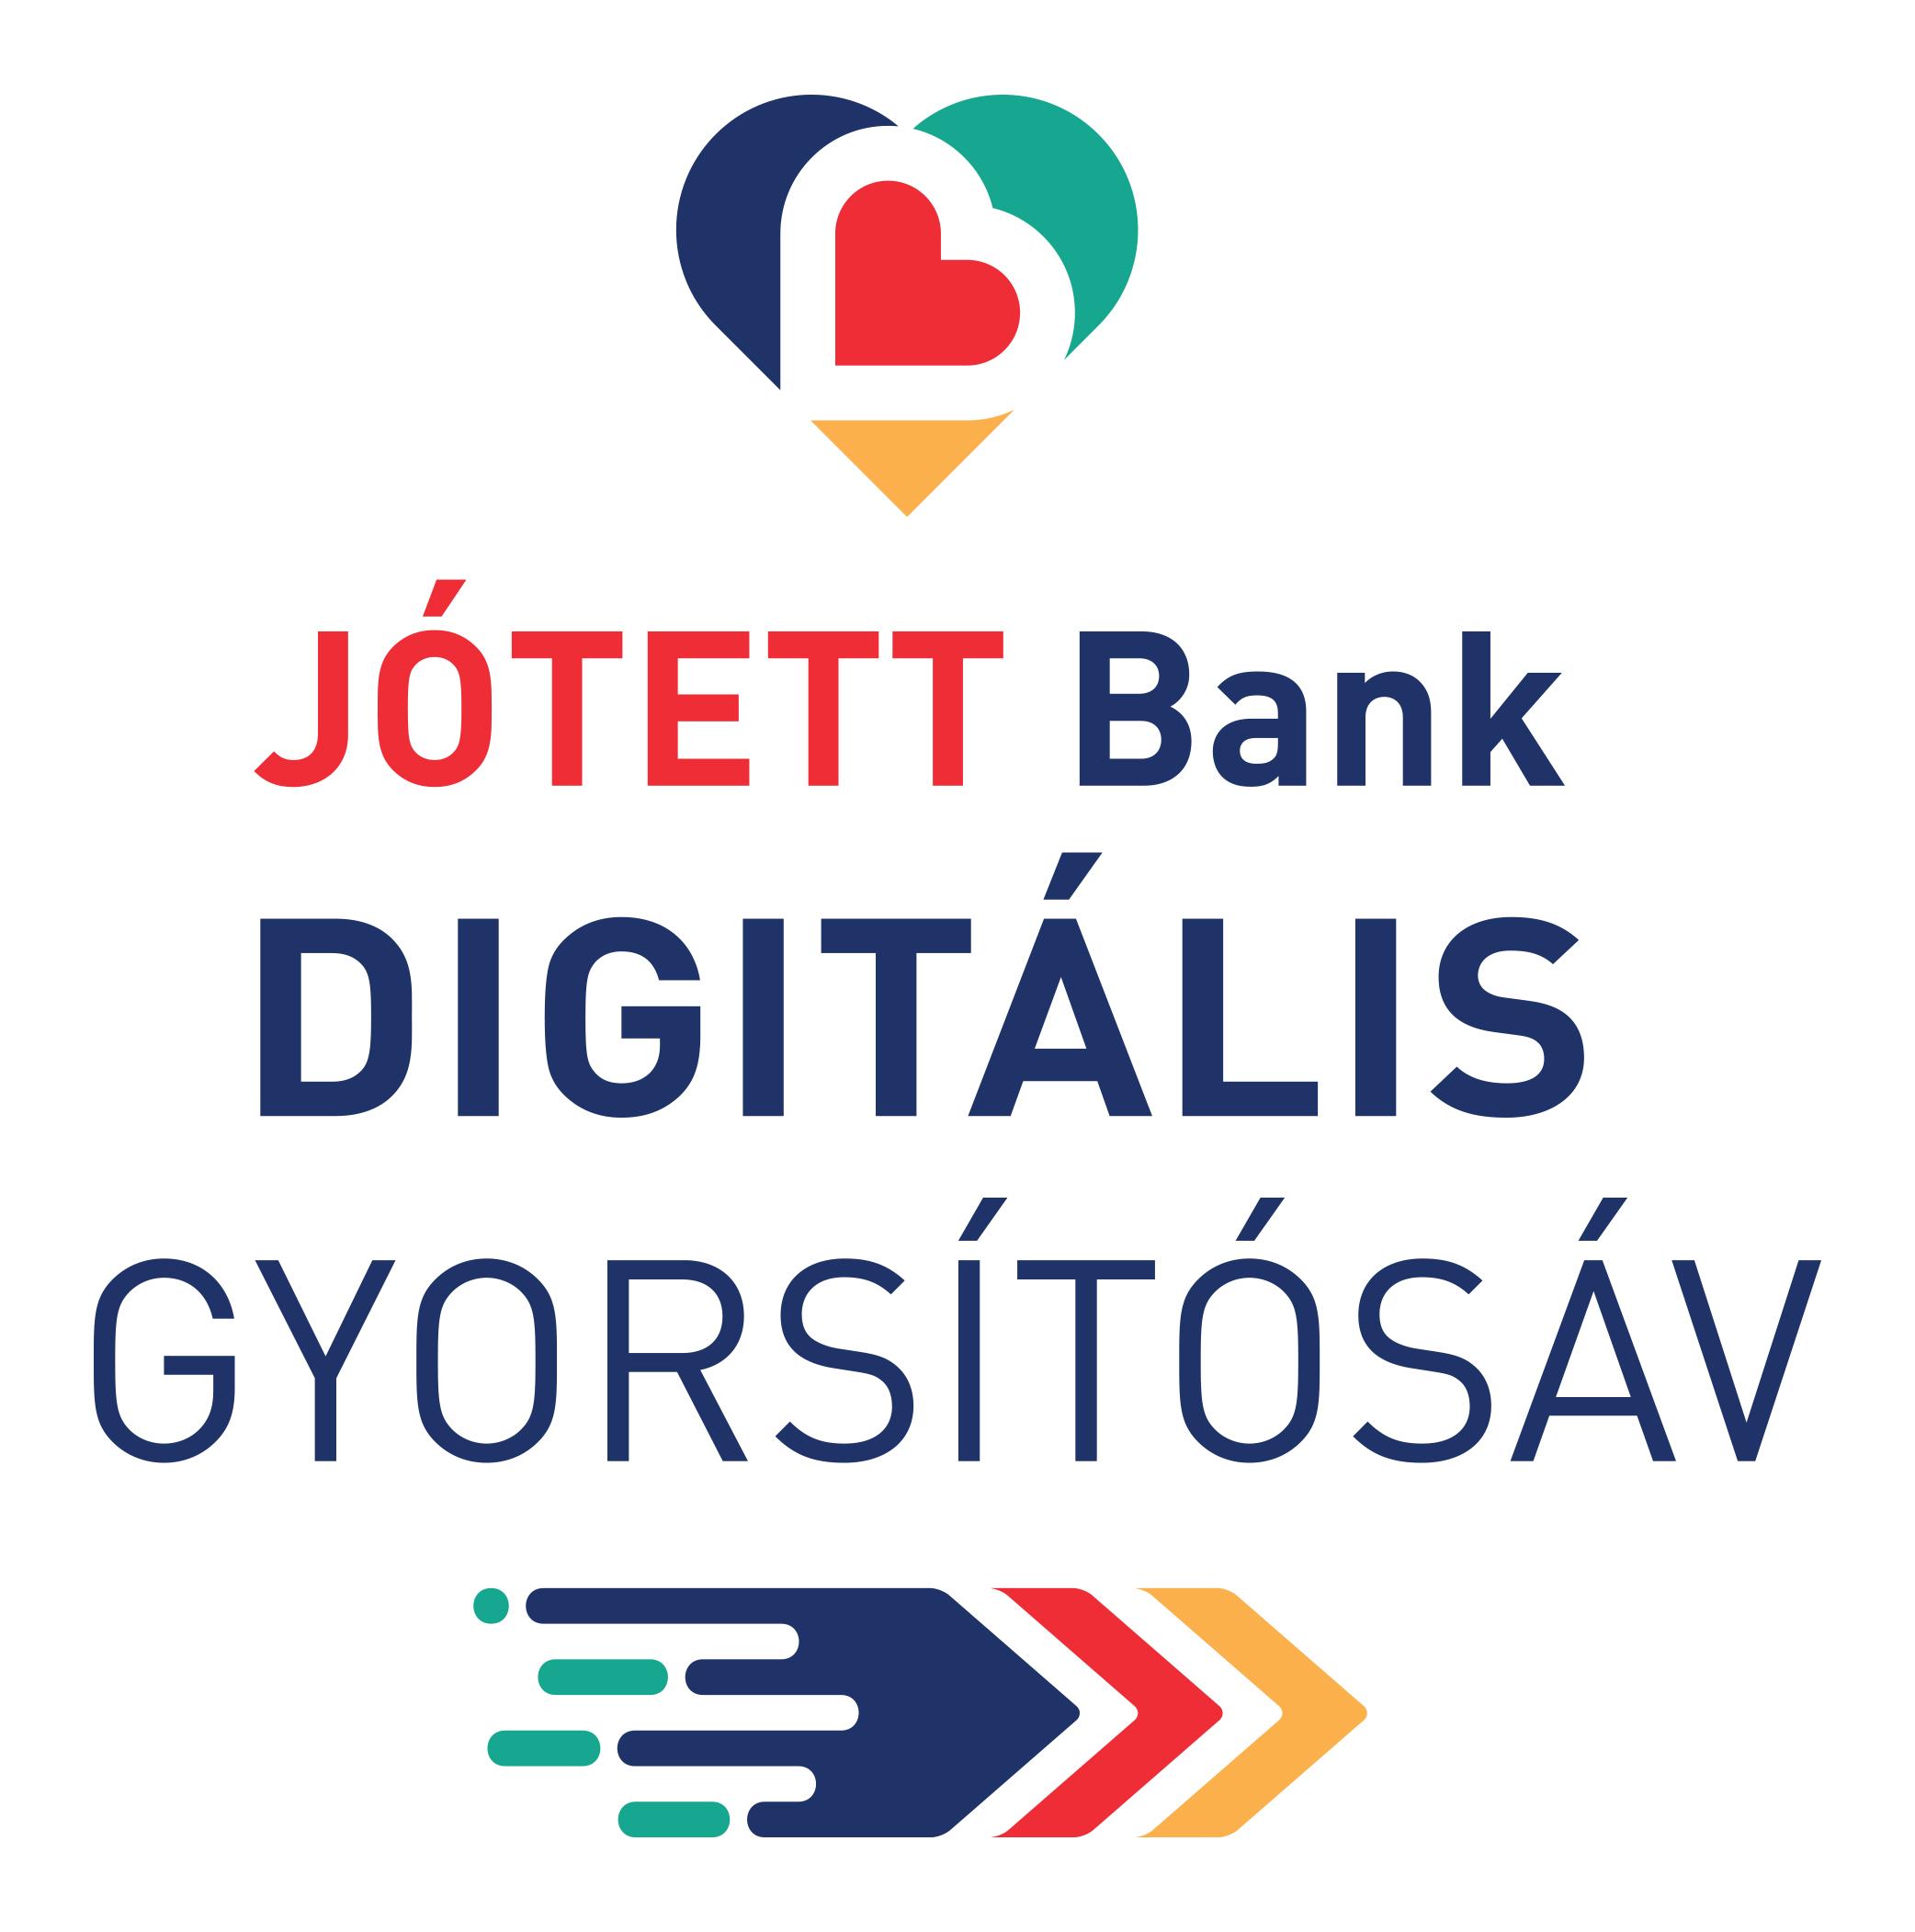 jotett_digitalis_gyorsitosav_logo_vert.jpg